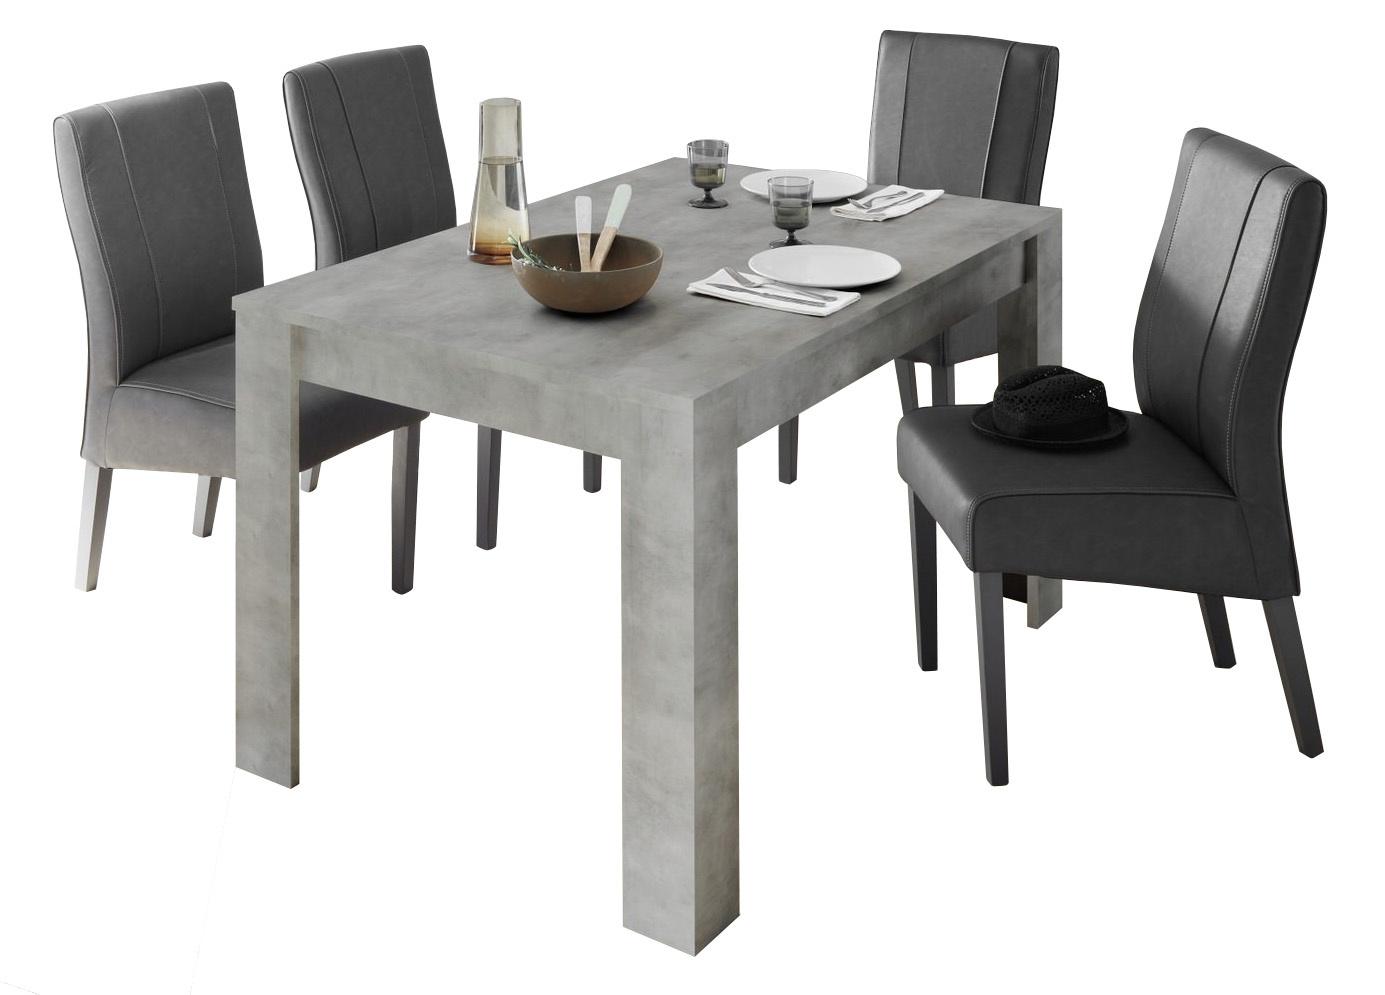 Eettafel Urbino 180 cm breed in grijs beton | Pesaro Mobilia